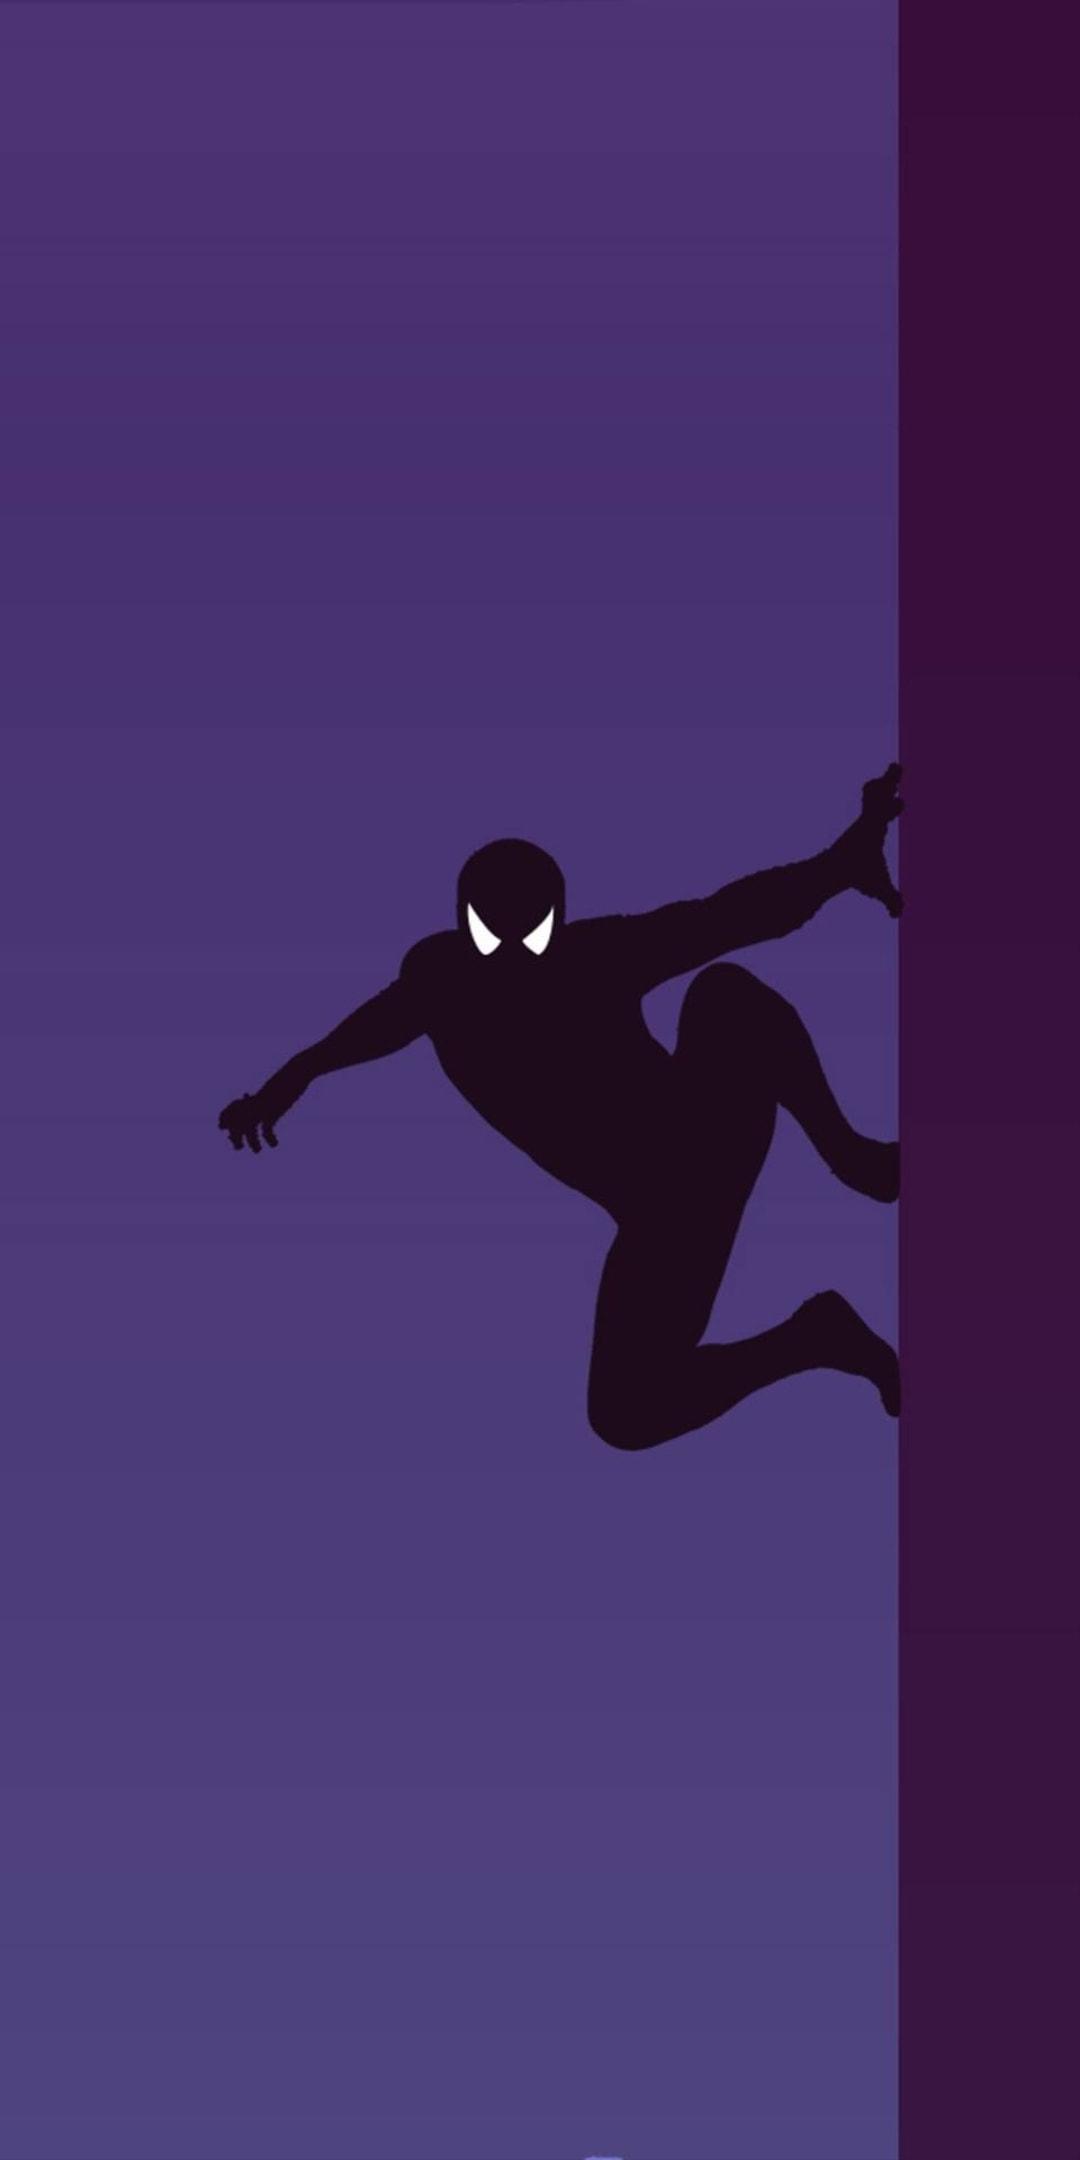 Amoled Spider Man iPhone Wallpaper